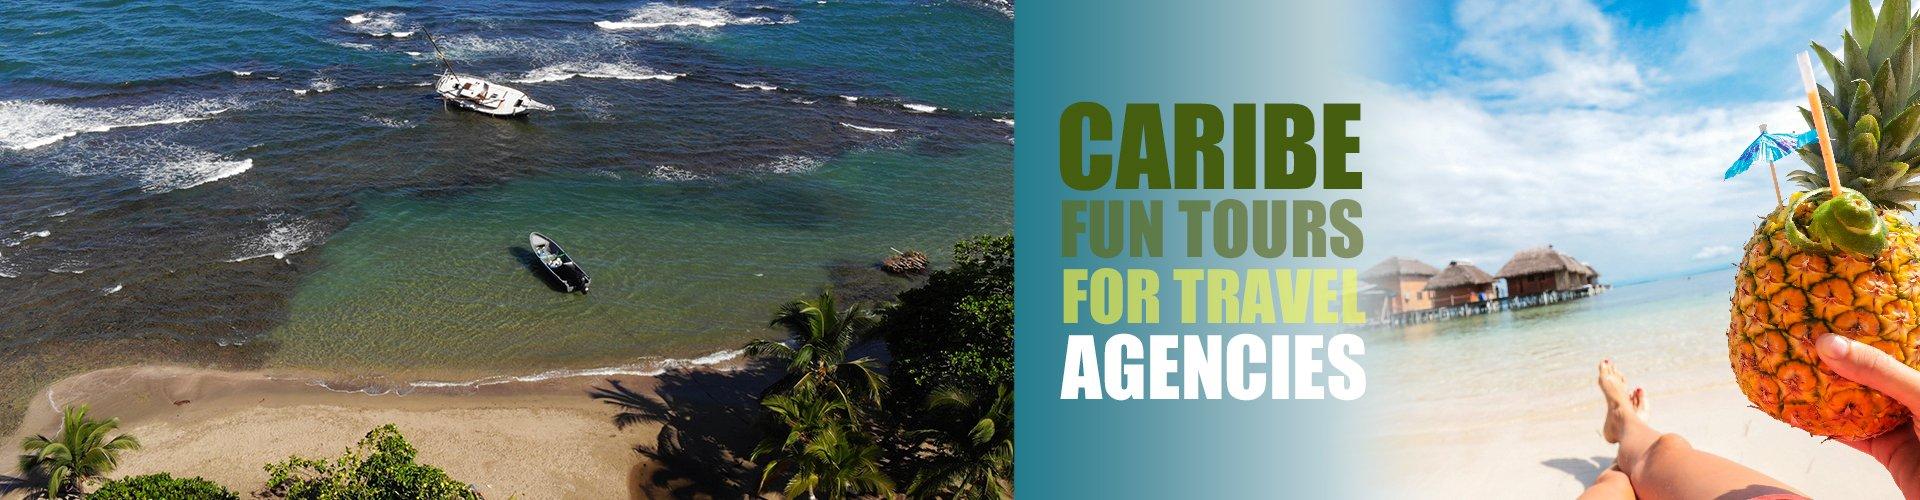 Travel Agency Partnerships